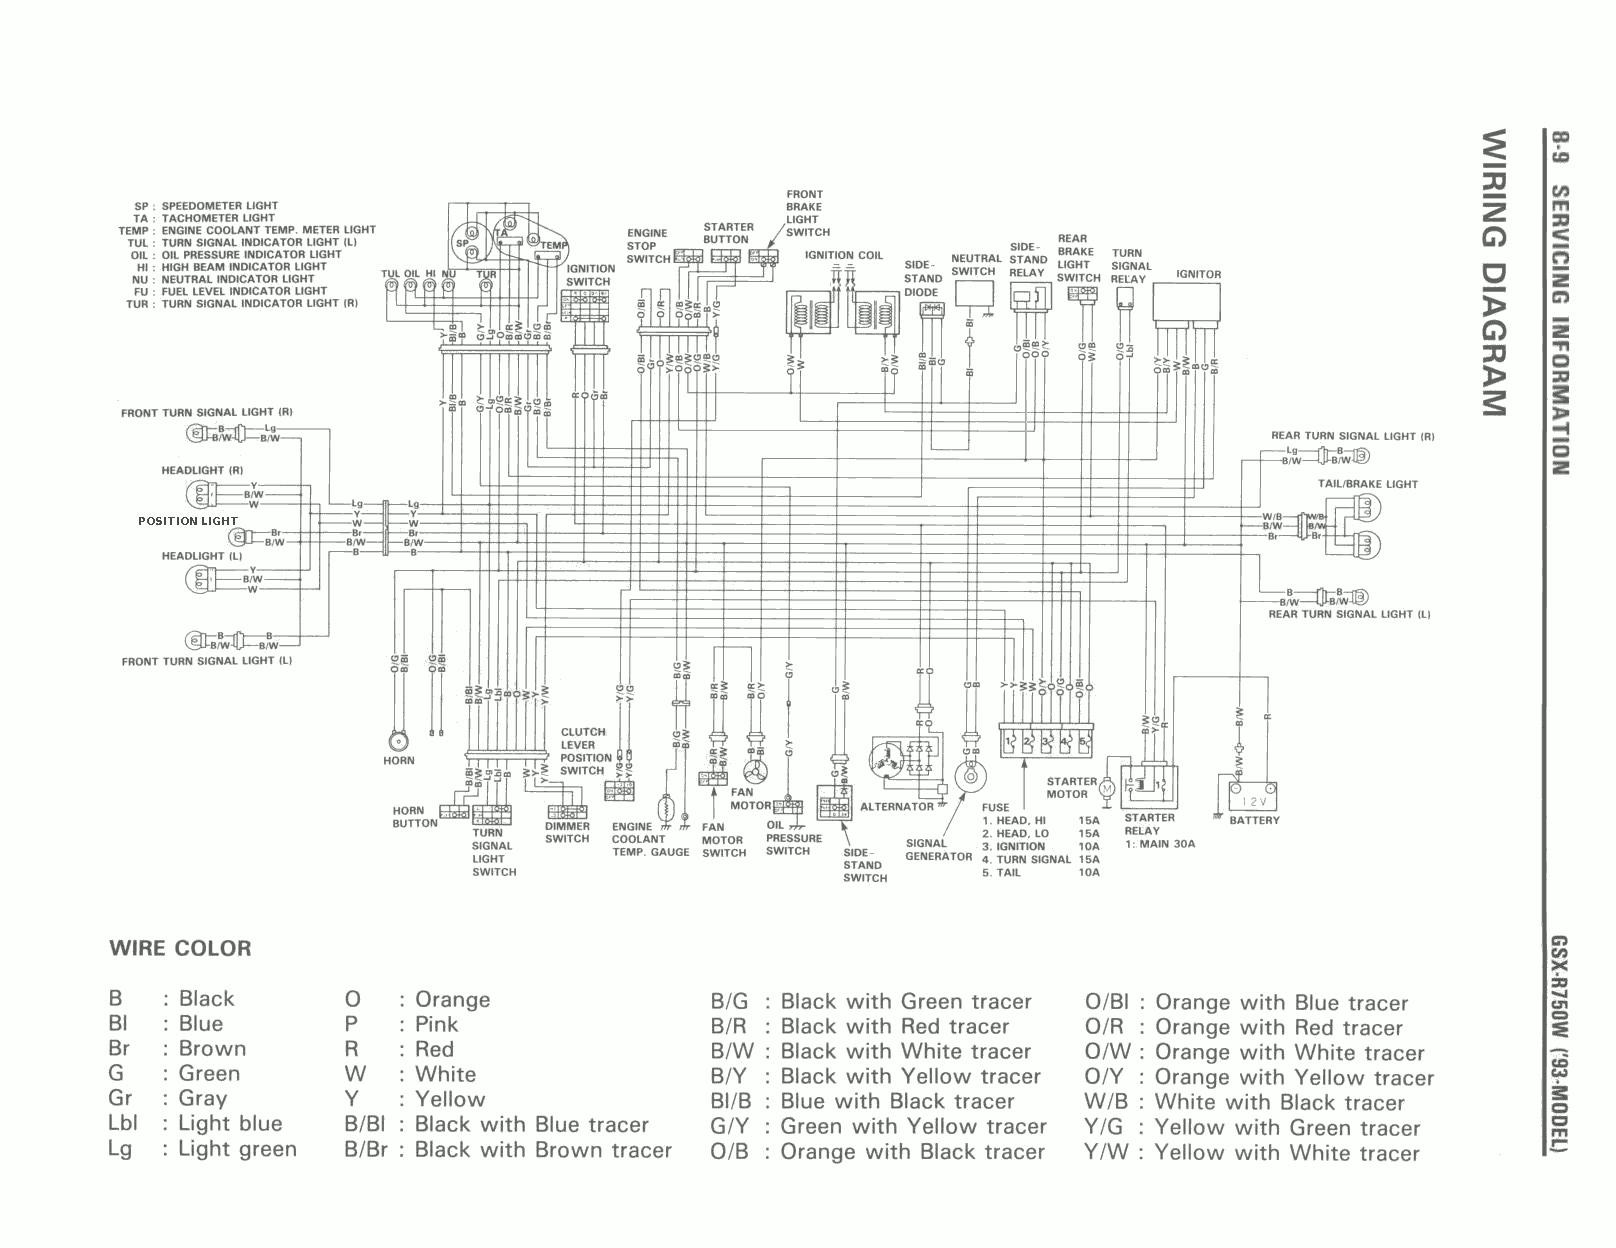 Dr250s 1990 Wiring Diagram Electrical Diagrams Suzuki 1983 Dr 250 350